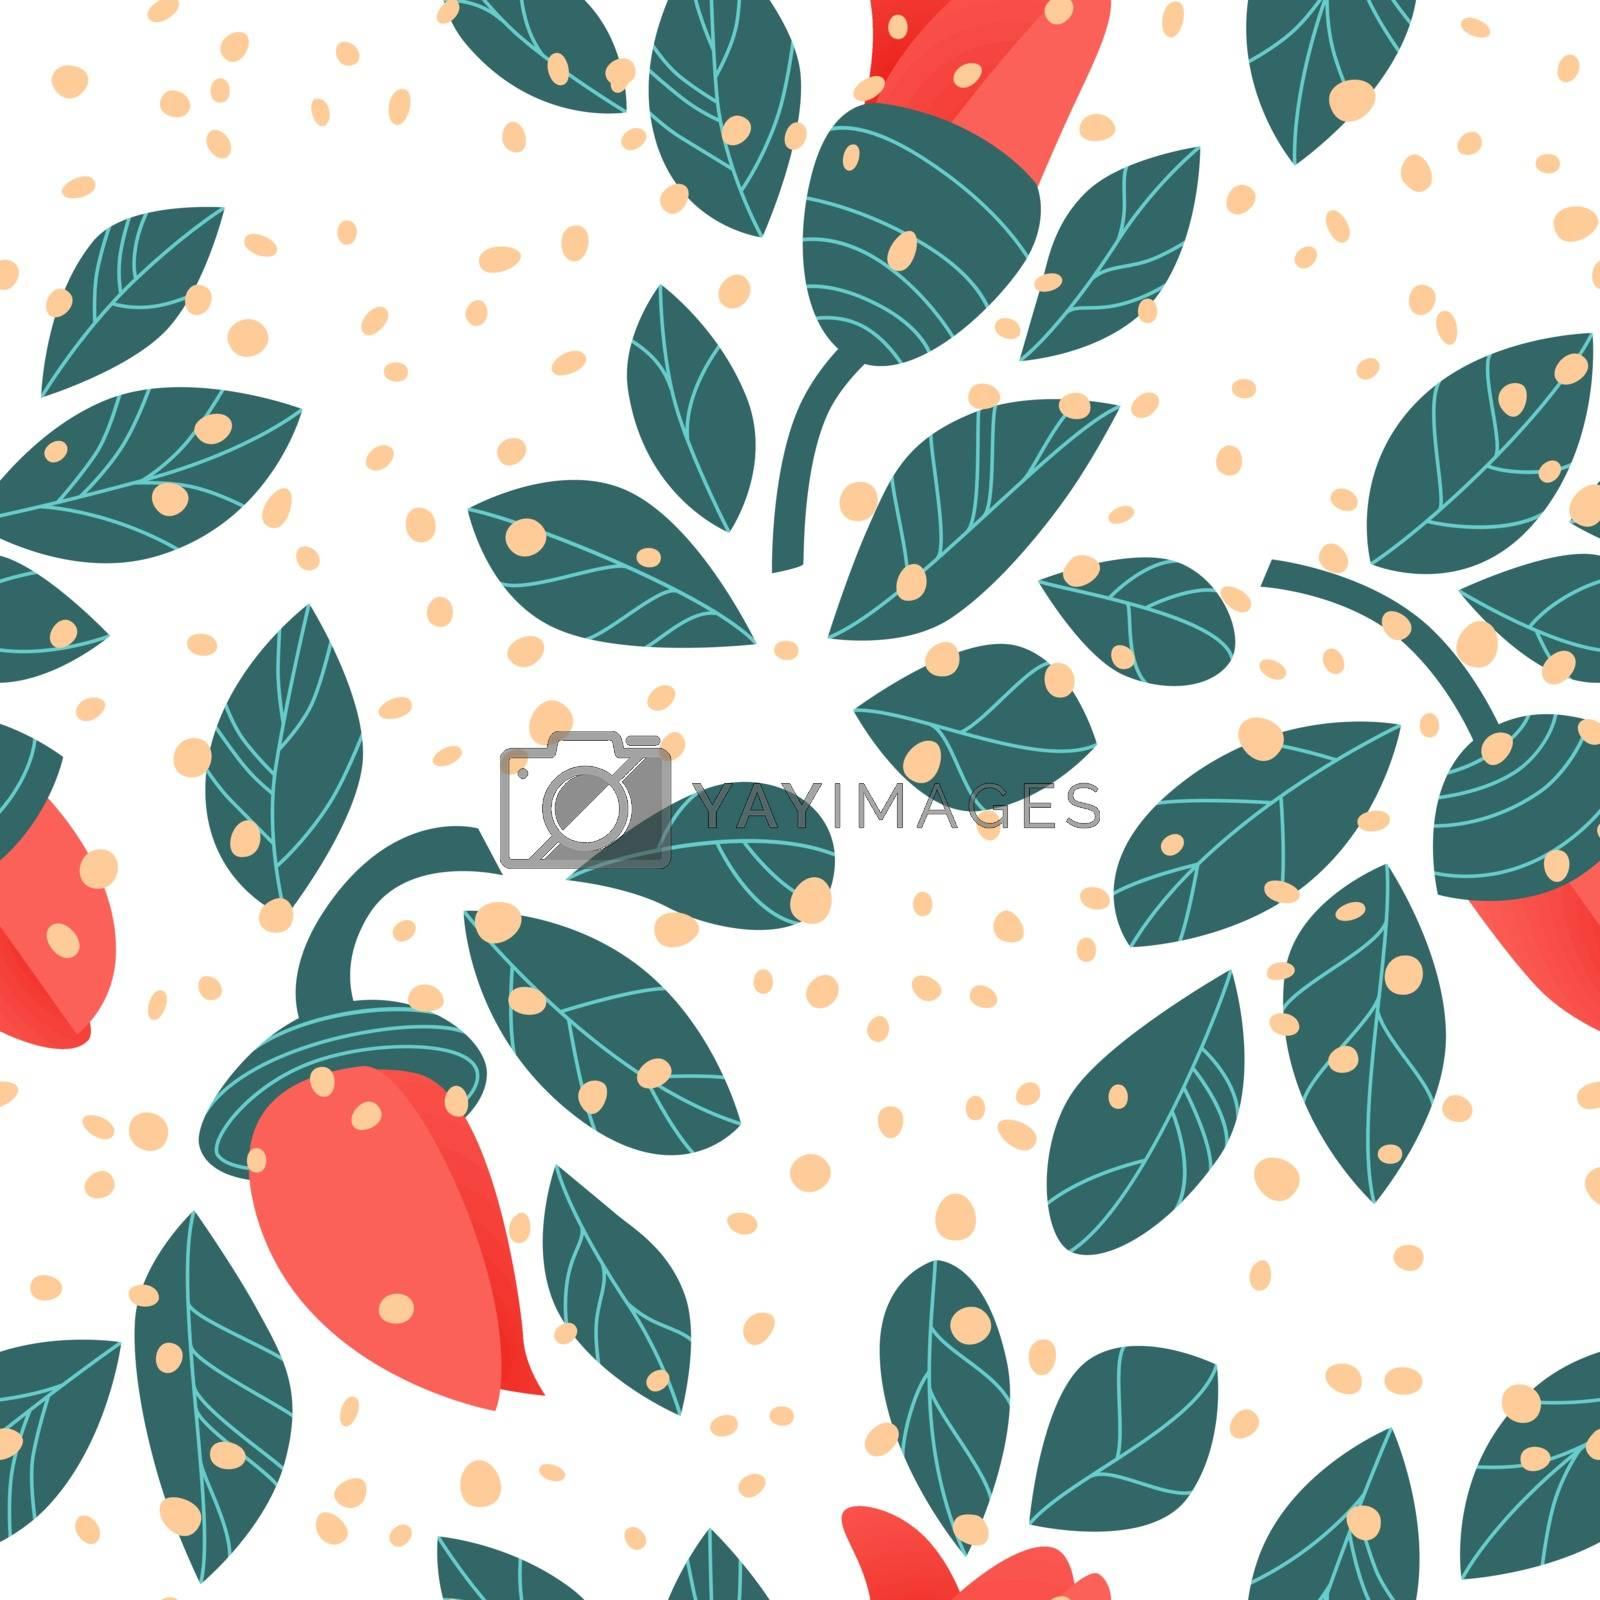 Royalty free image of Vector floral pattern by Olatarakanova